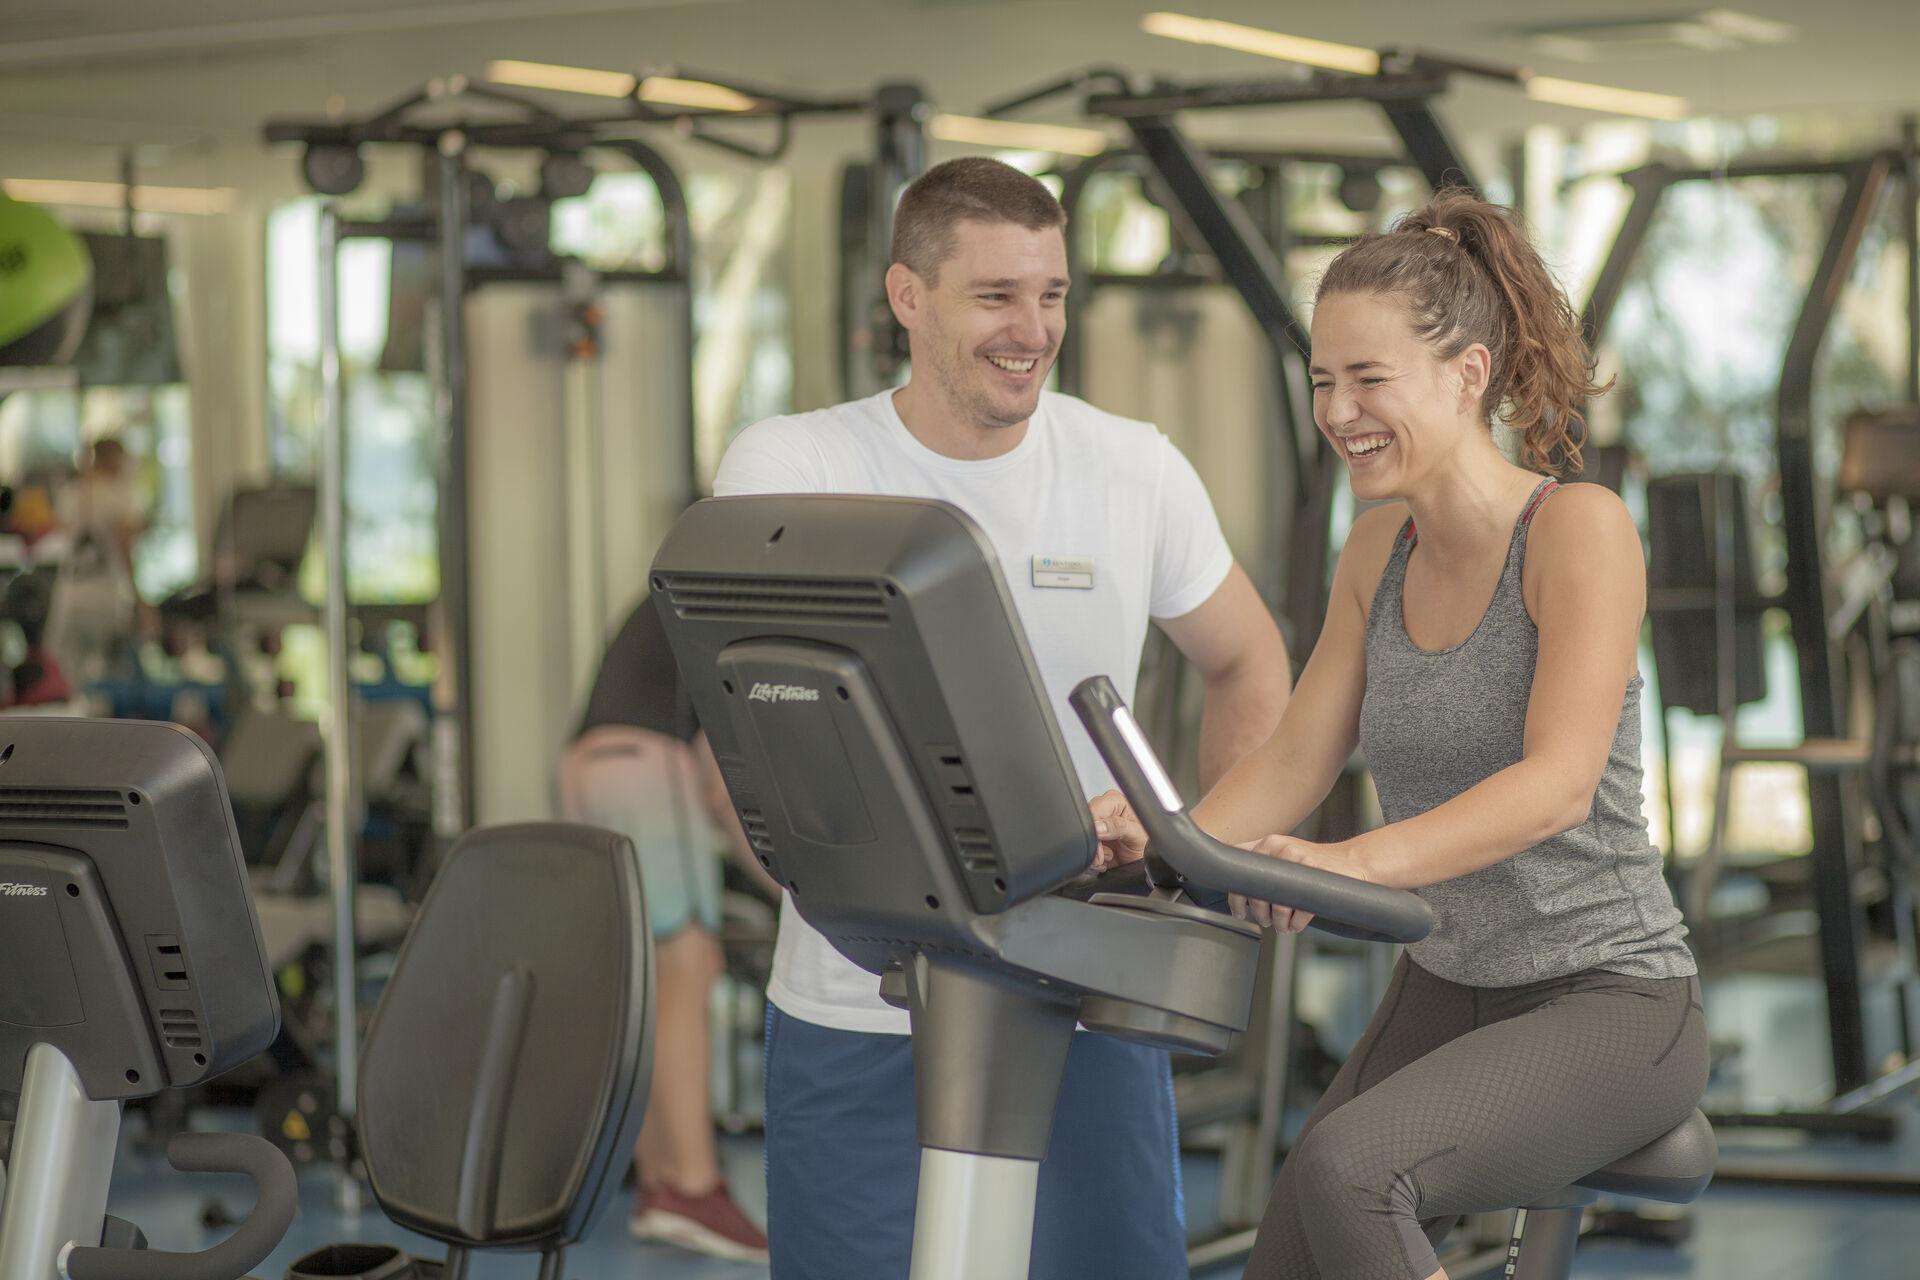 https://cms.satur.sk/data/imgs/tour_image/orig/bluesun_berulia-fitness-instructor-2-1956621.jpg